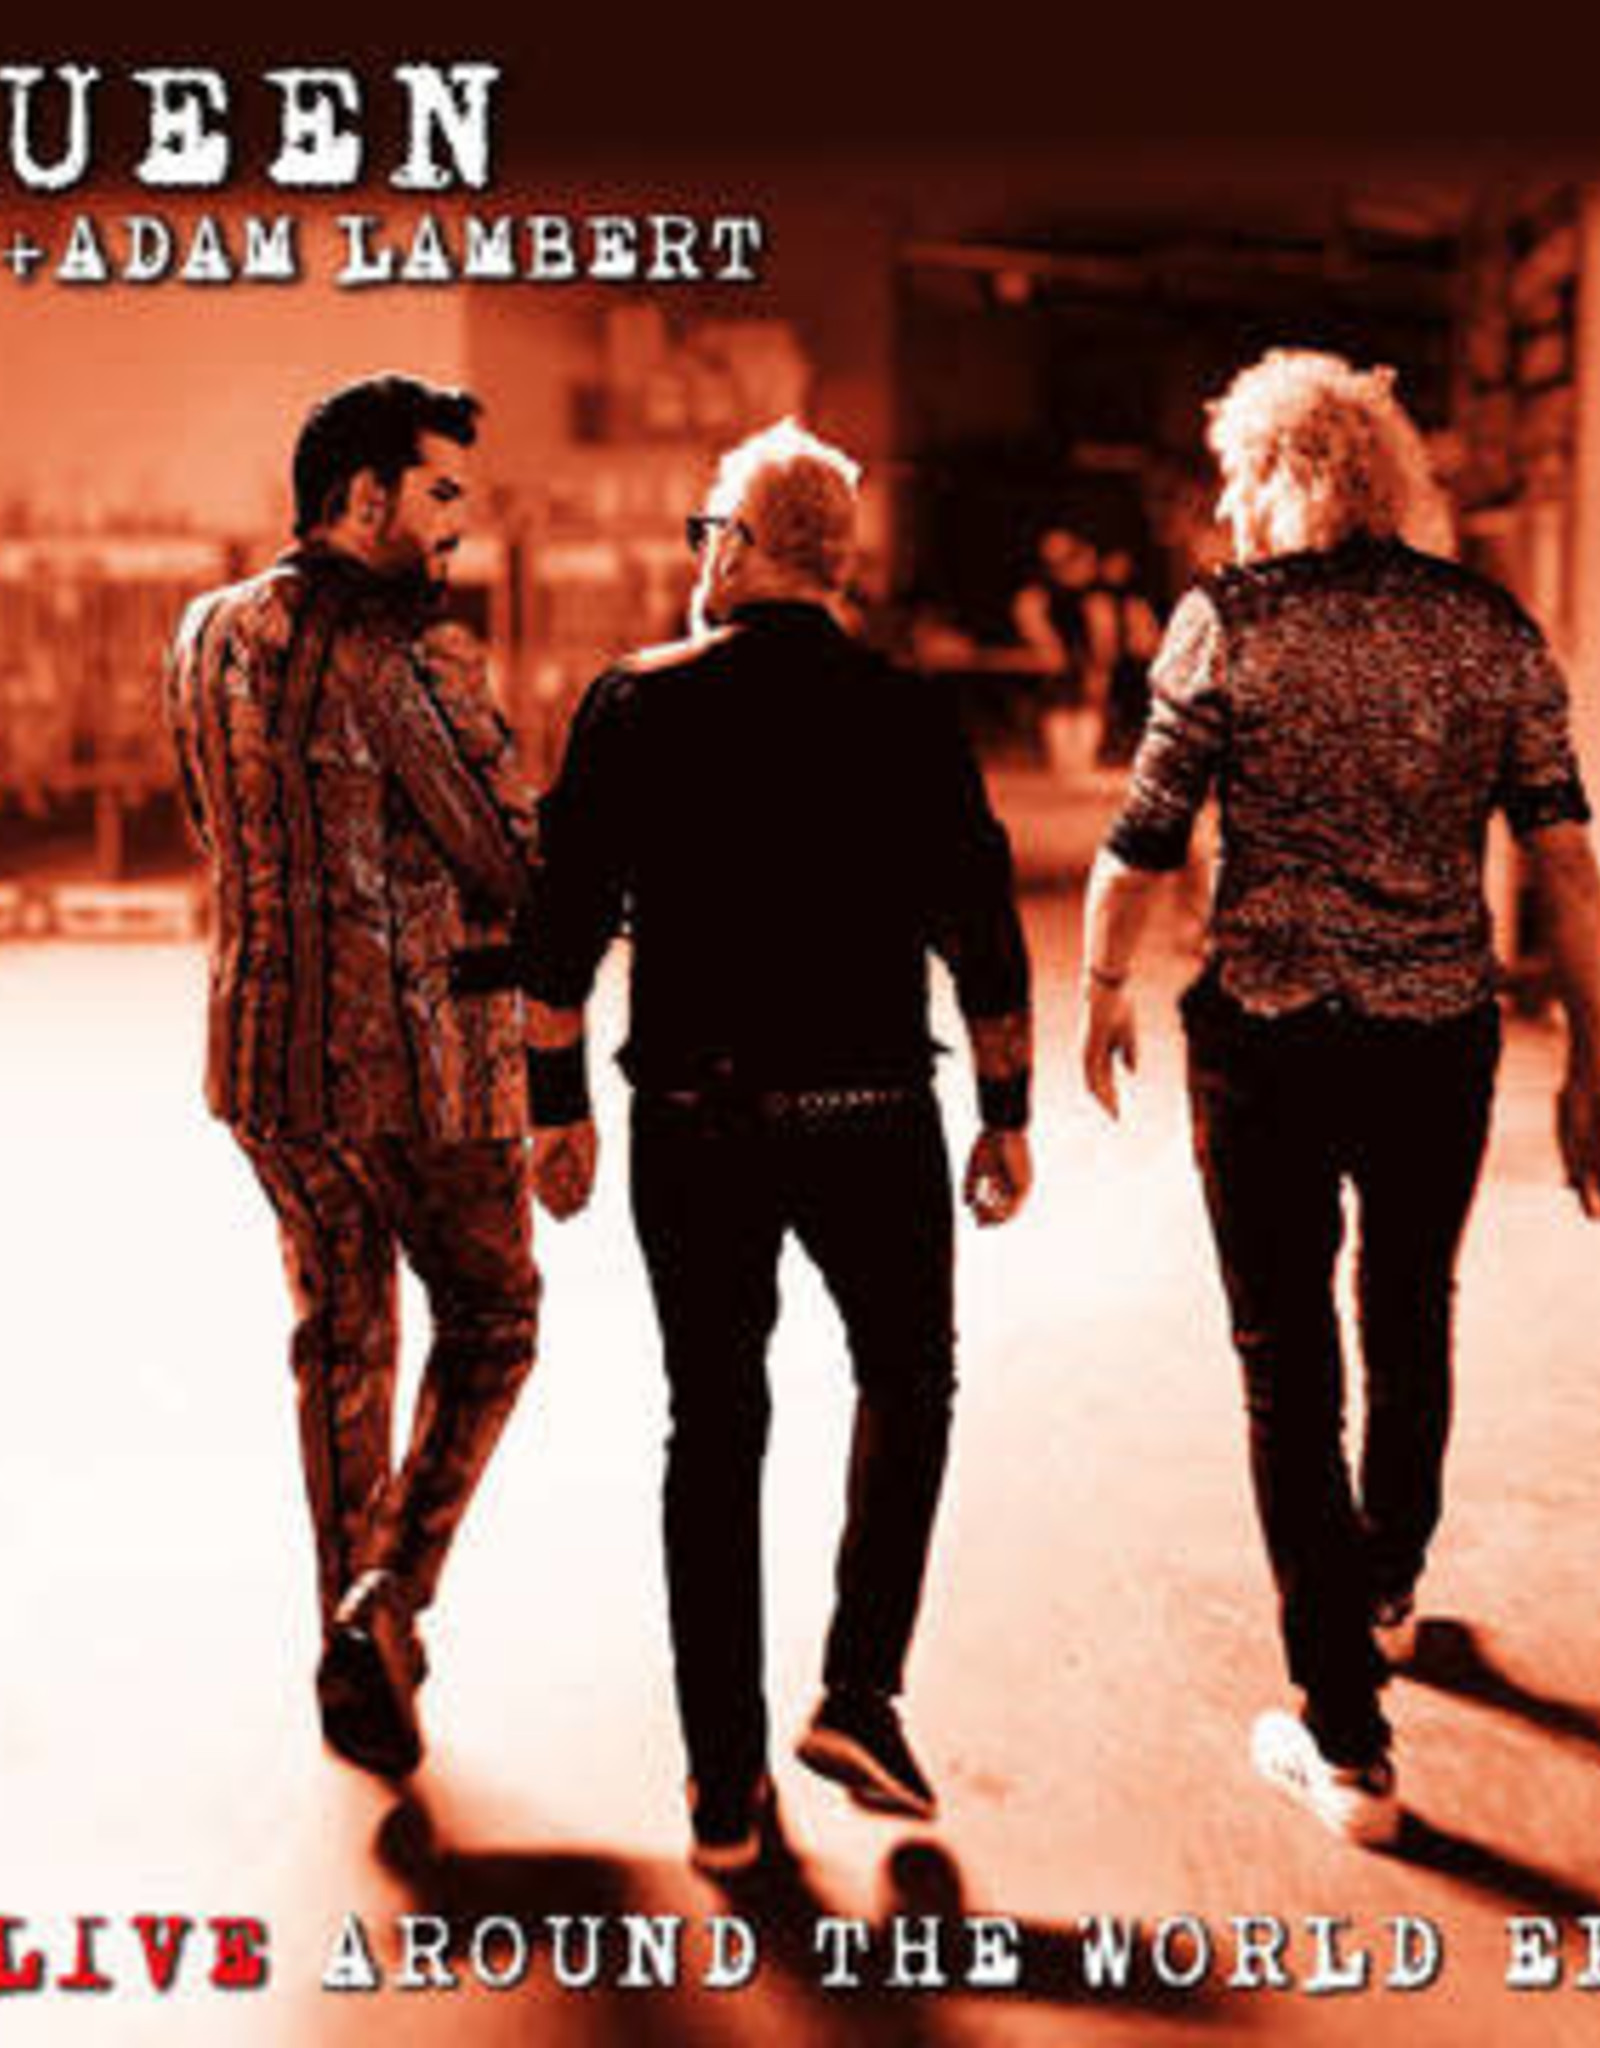 Freddie Mercury/Queen + Adam LambertLive Around The World / Love Me Like There's No Tomorrow (RSD 7/21)